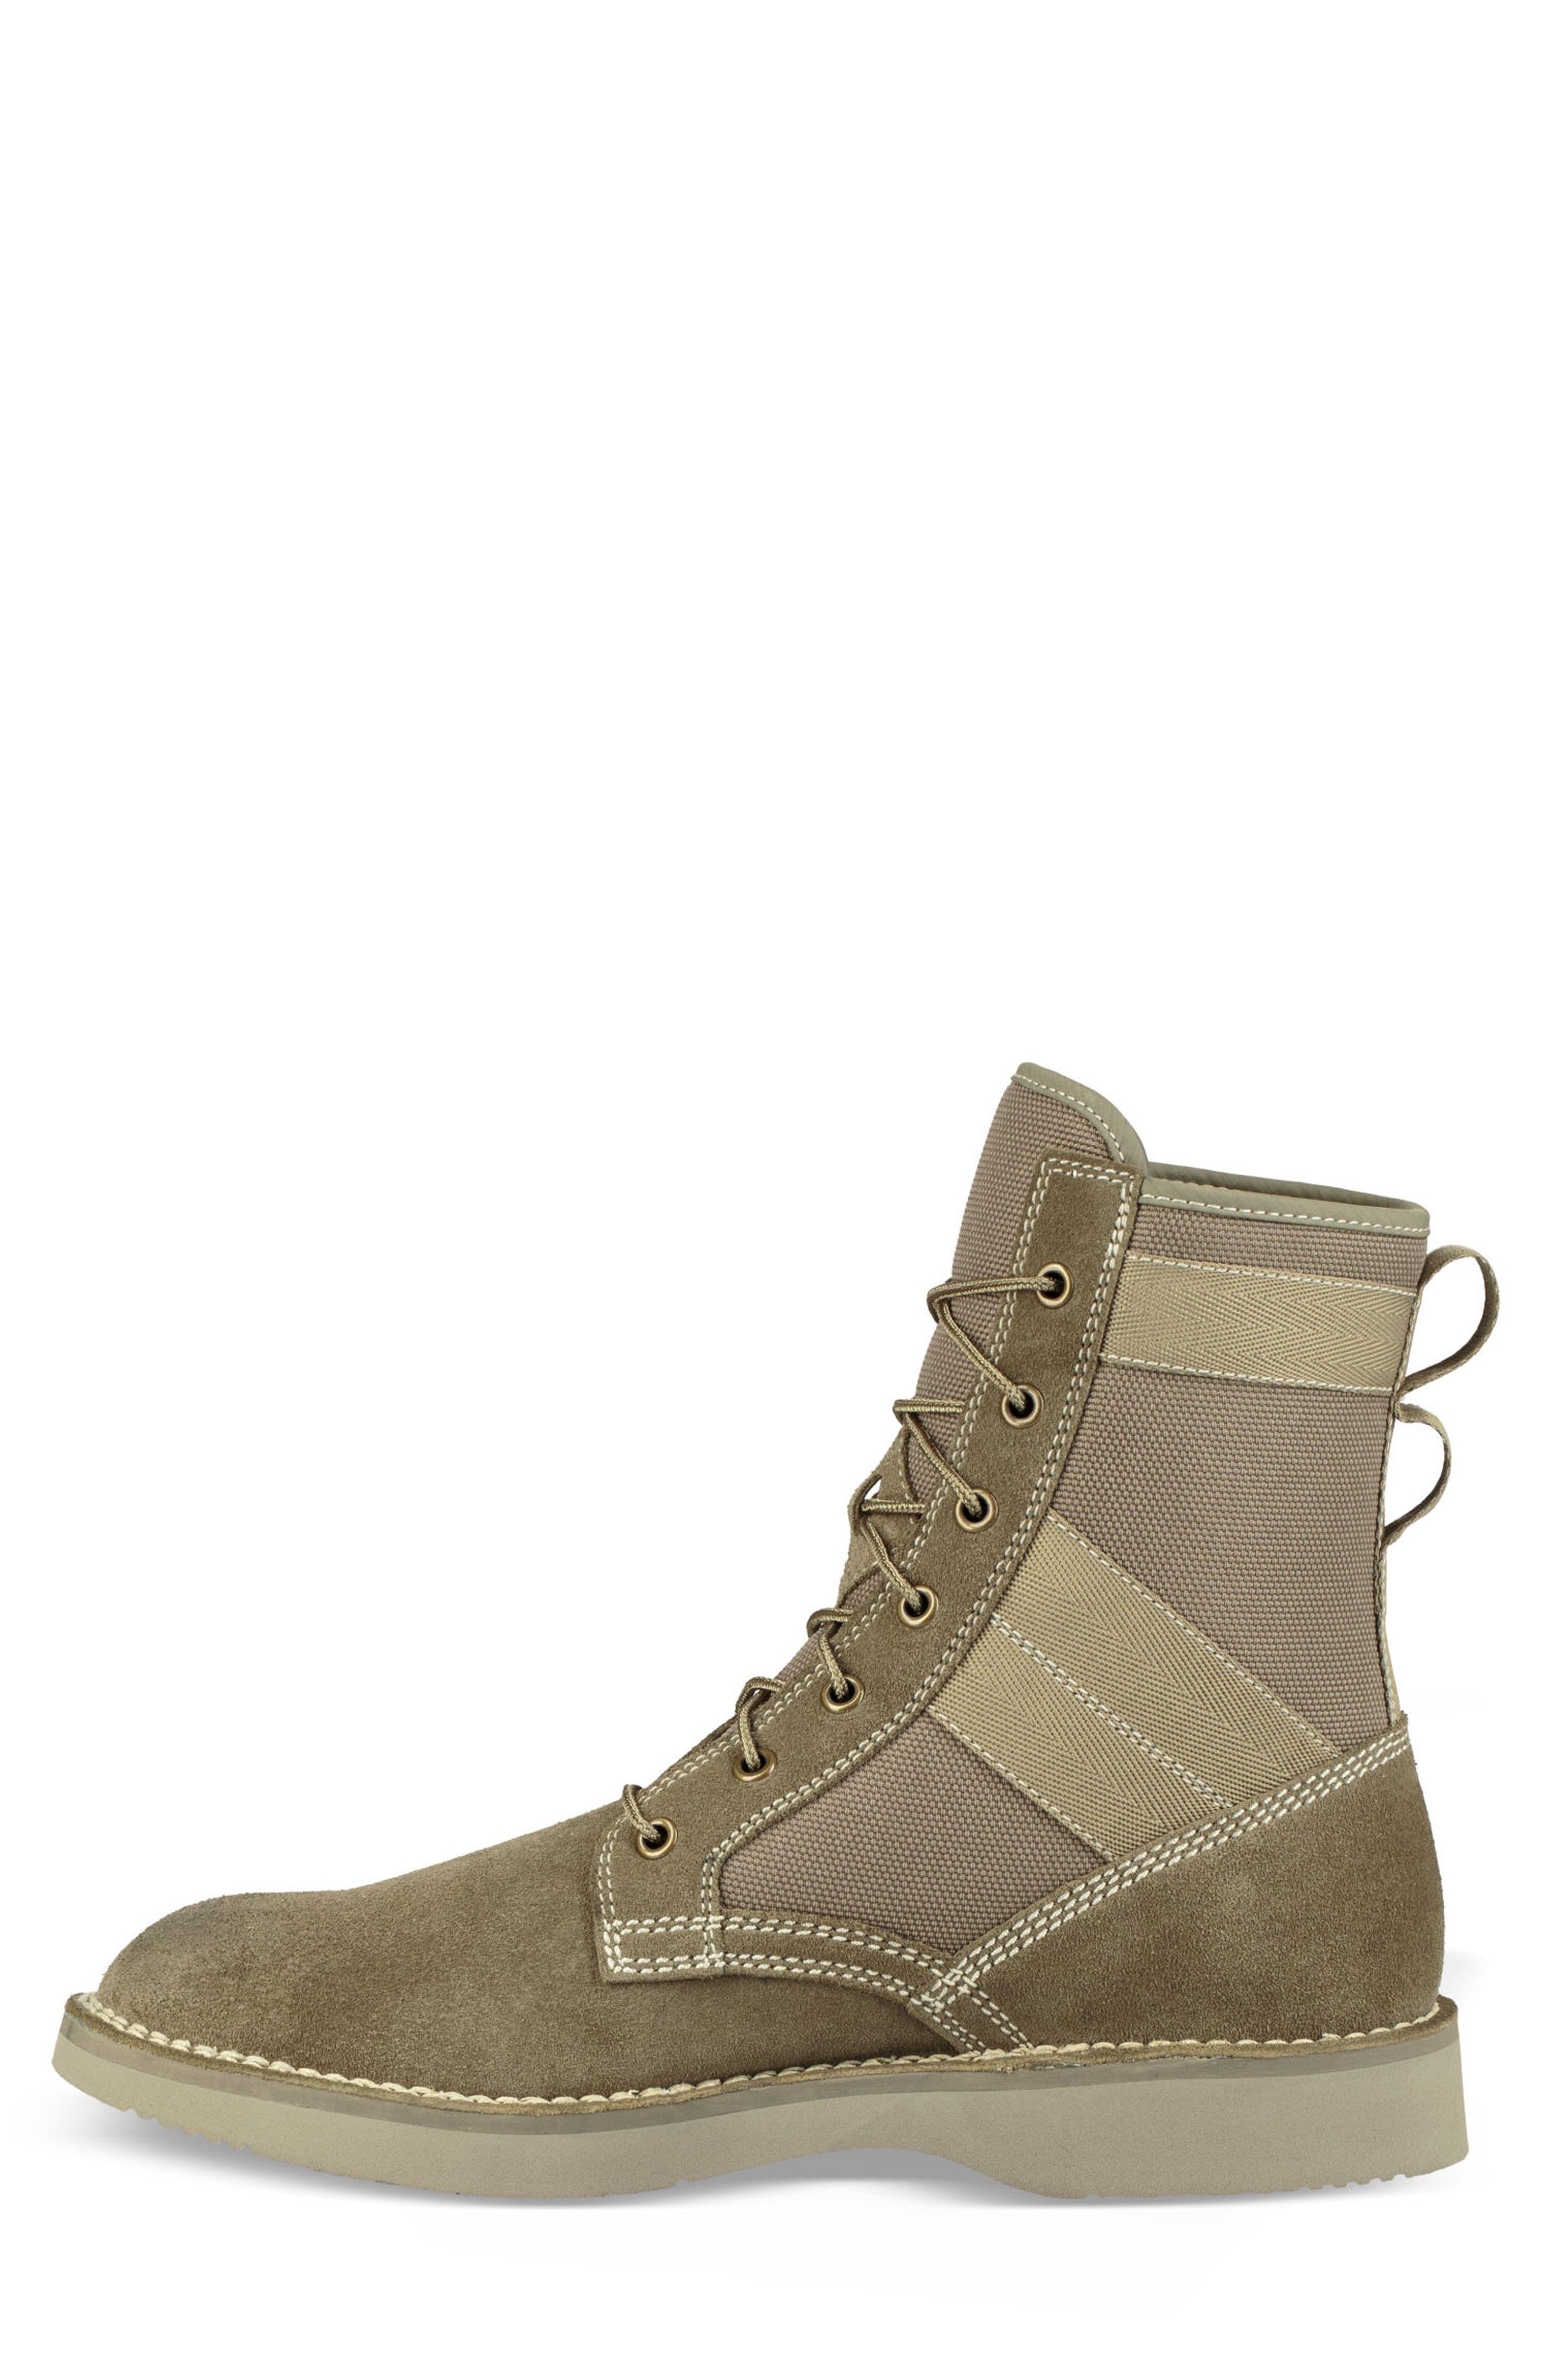 Camino Plain Toe Boot,                             Alternate thumbnail 3, color,                             TAUPE